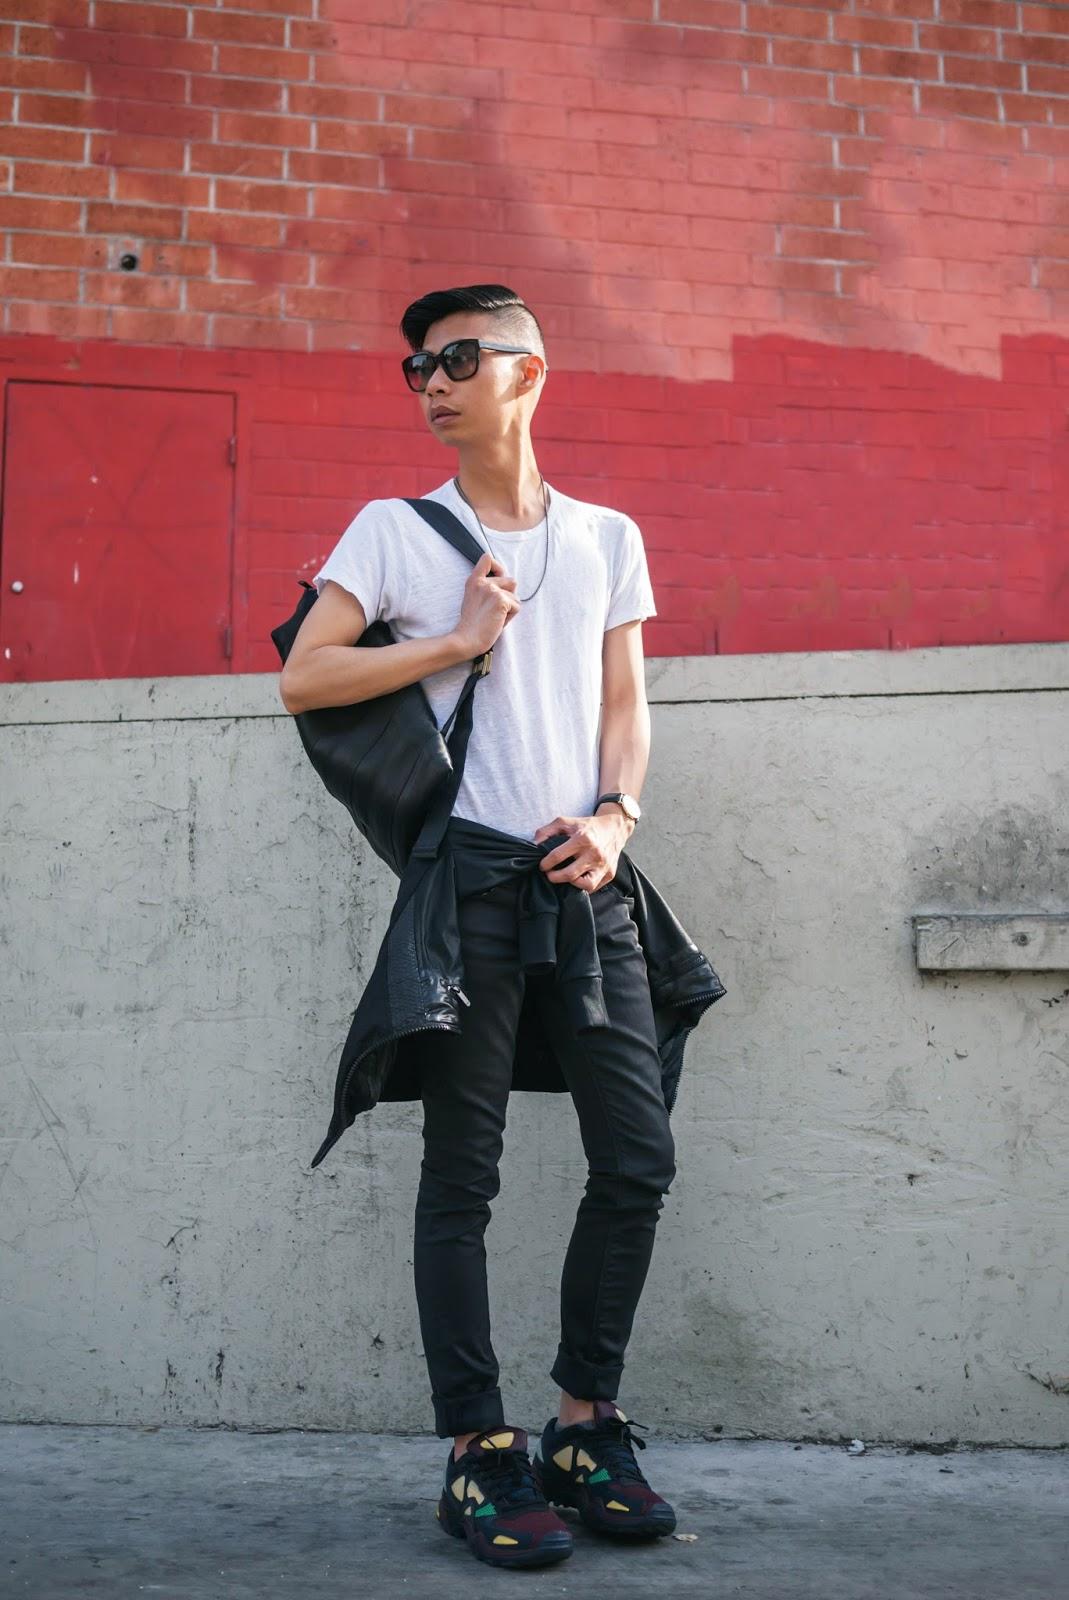 mybelonging-tommylei-menswearblogger-streetstyle-kaopaoshu-adidas-rafsimons-warbyparker-3.jpg